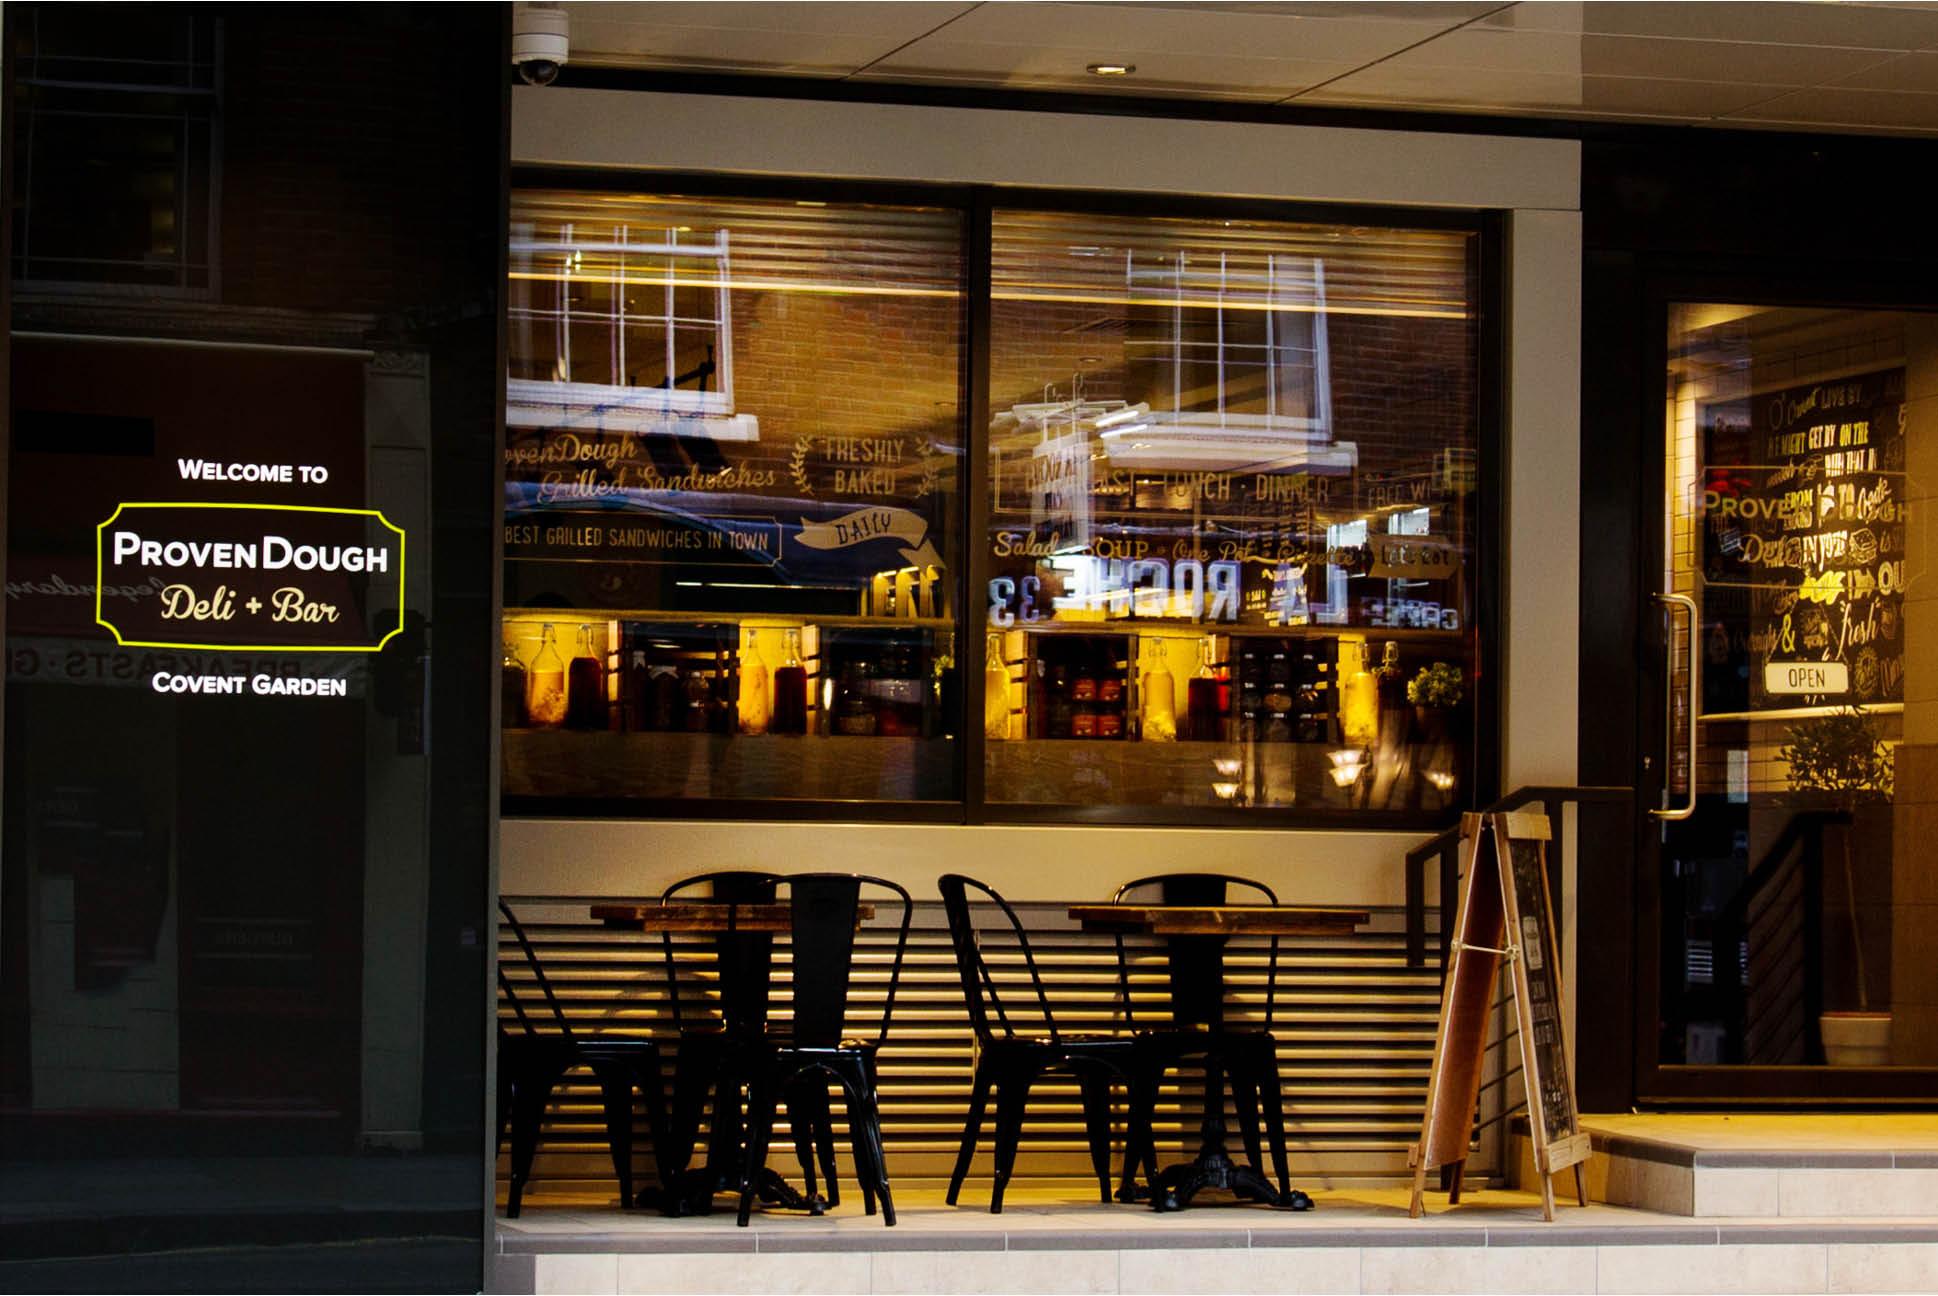 ProvenDough Signage   Branding and Identity Design - Independent Marketing   IM London